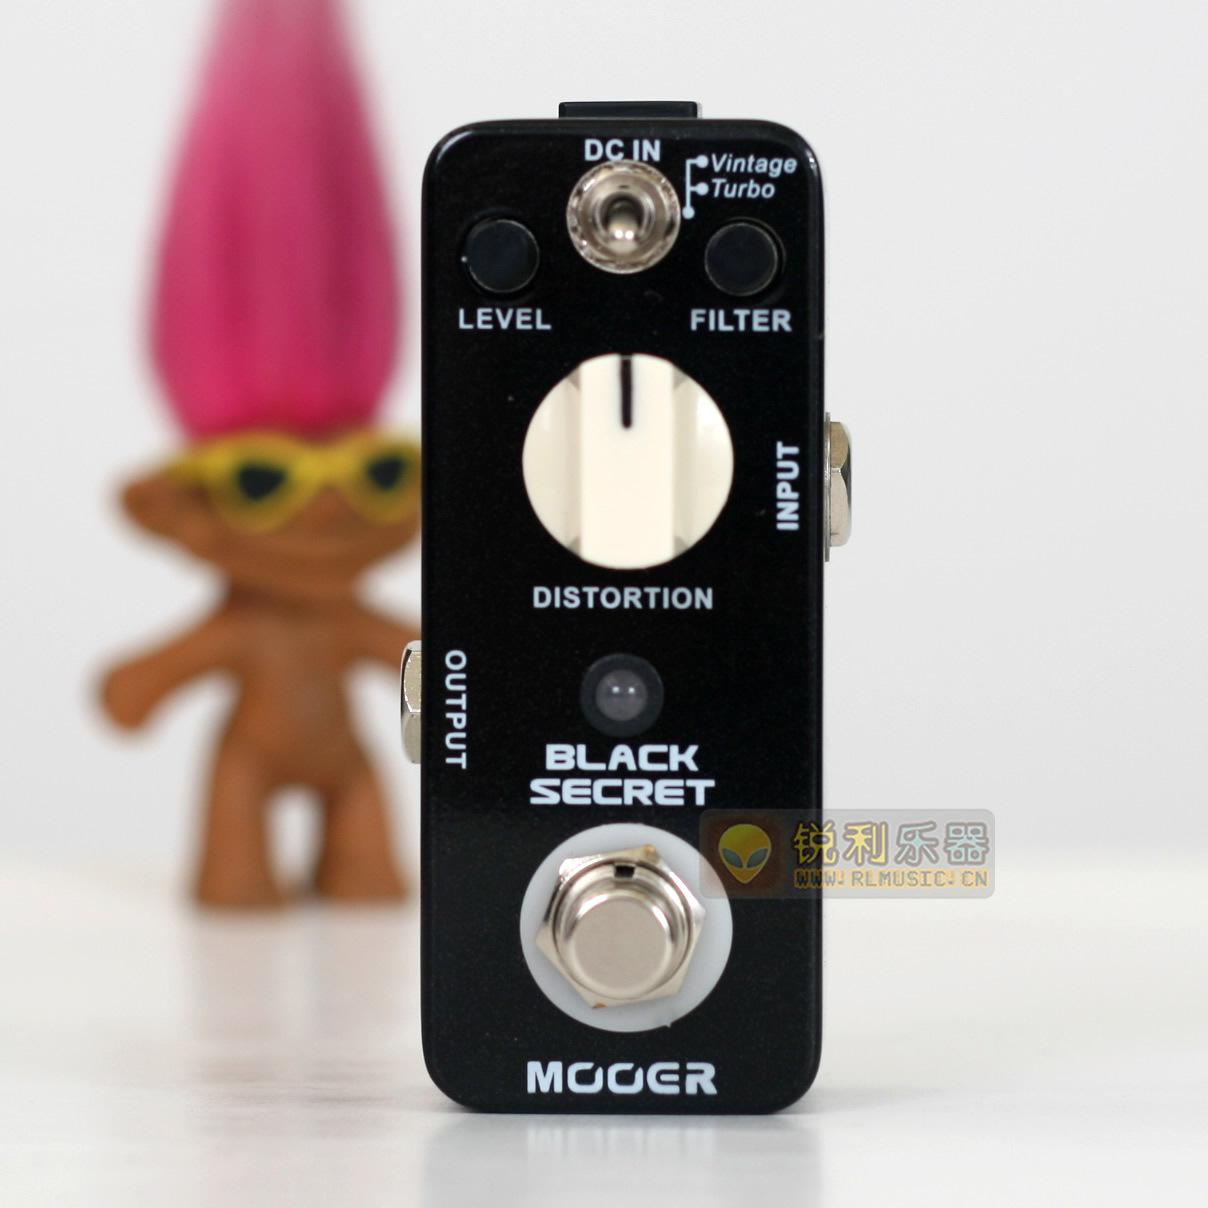 【Mooer Black Secret】魔耳 RAT 失真效果器【锐利乐器】